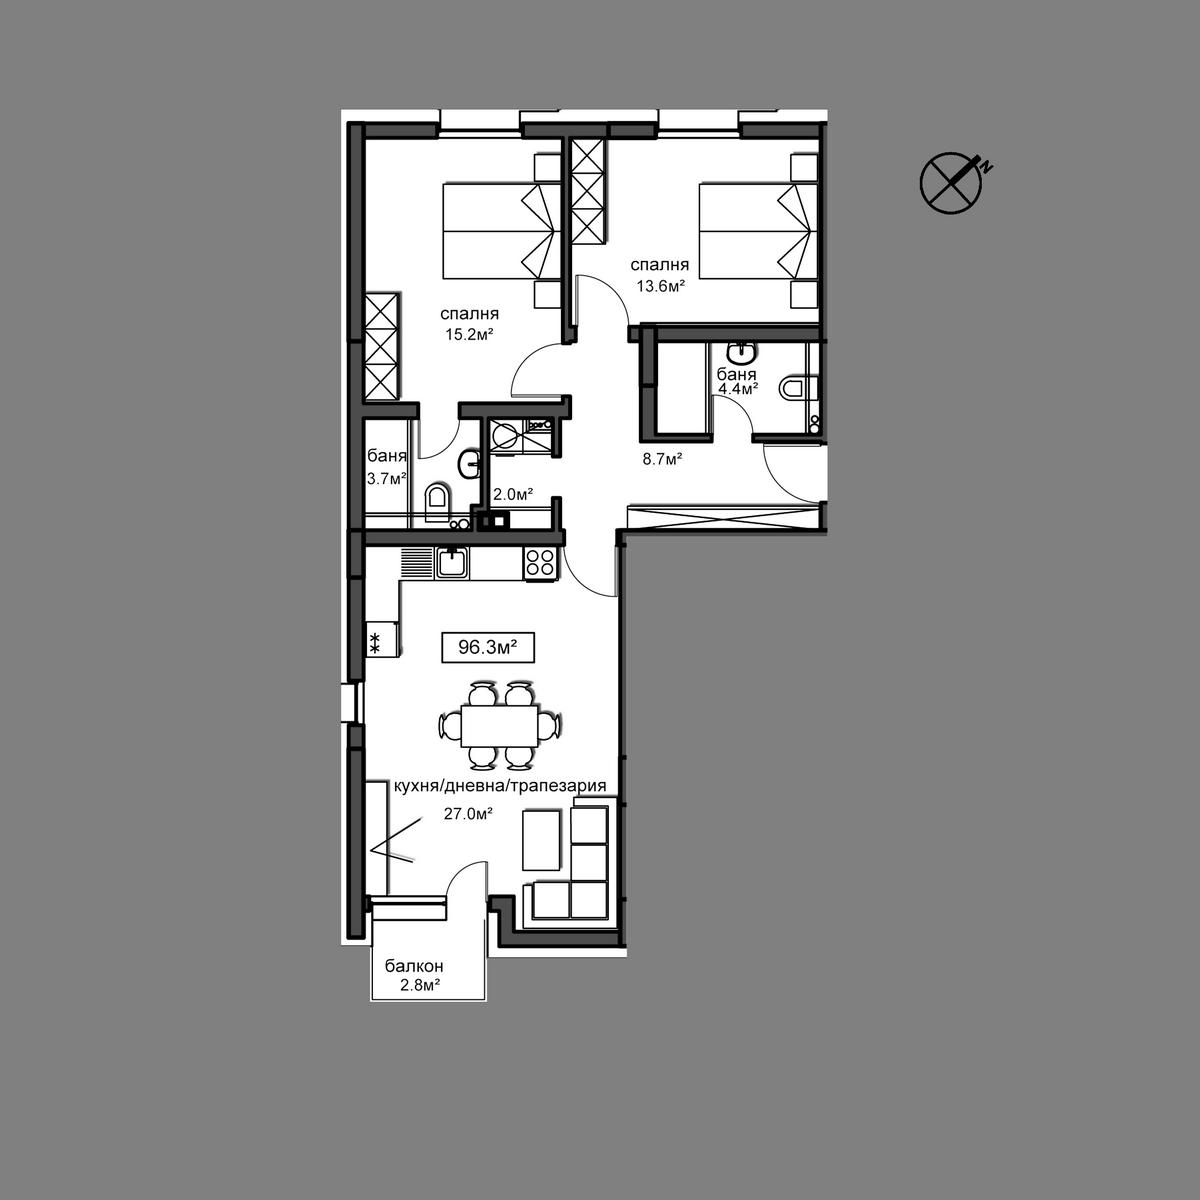 Продава апартамент ново строителство - Апартамент А7